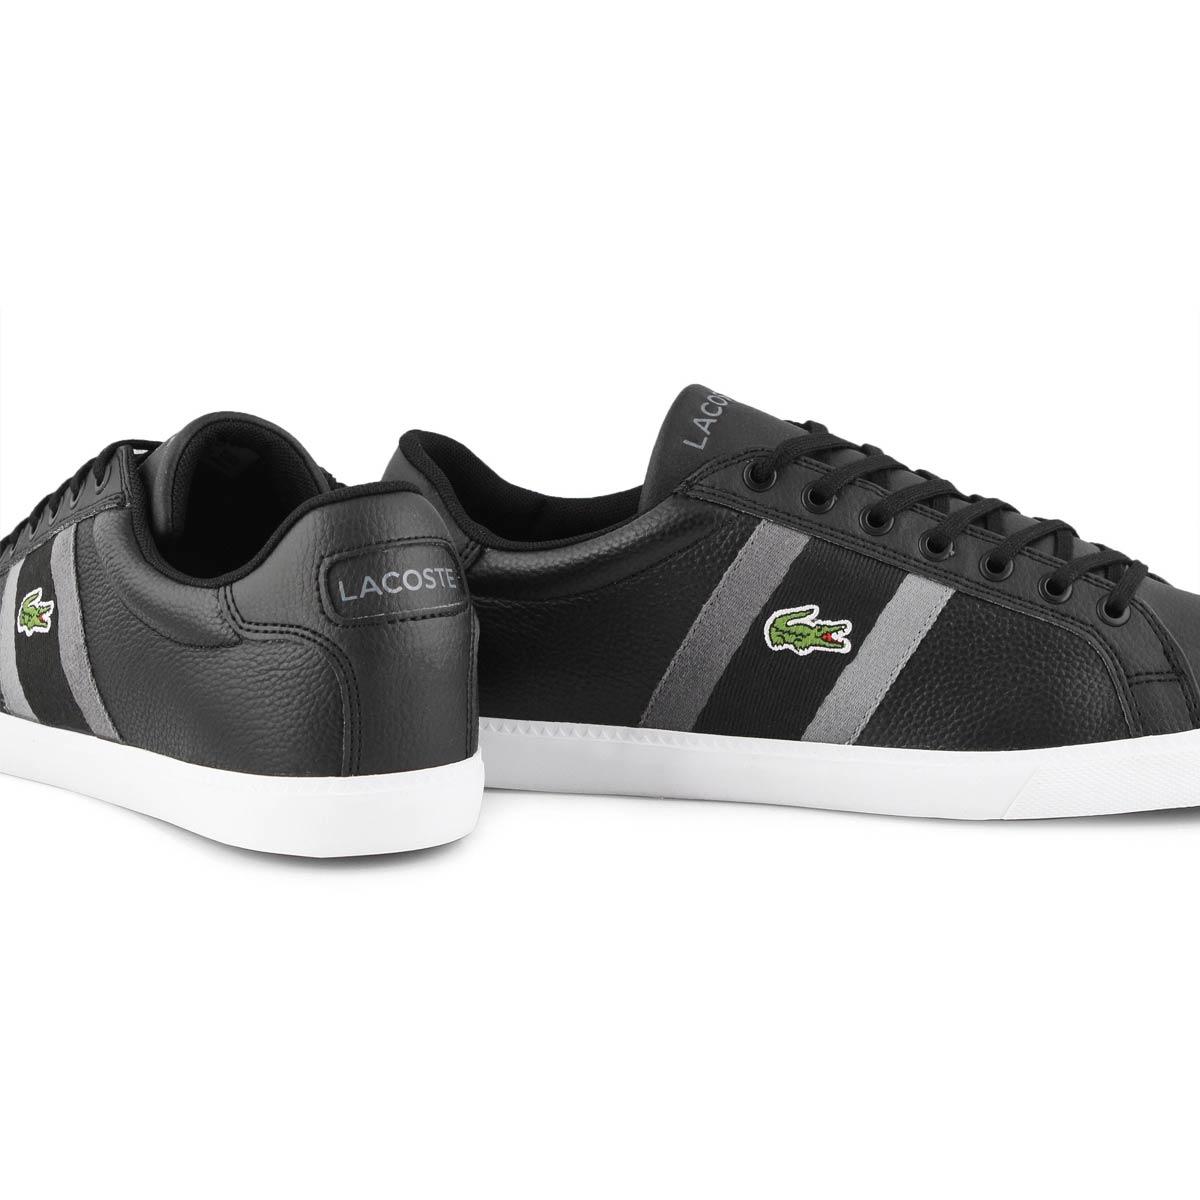 Mns Grad Vulc 120 2 blk/gry sneaker